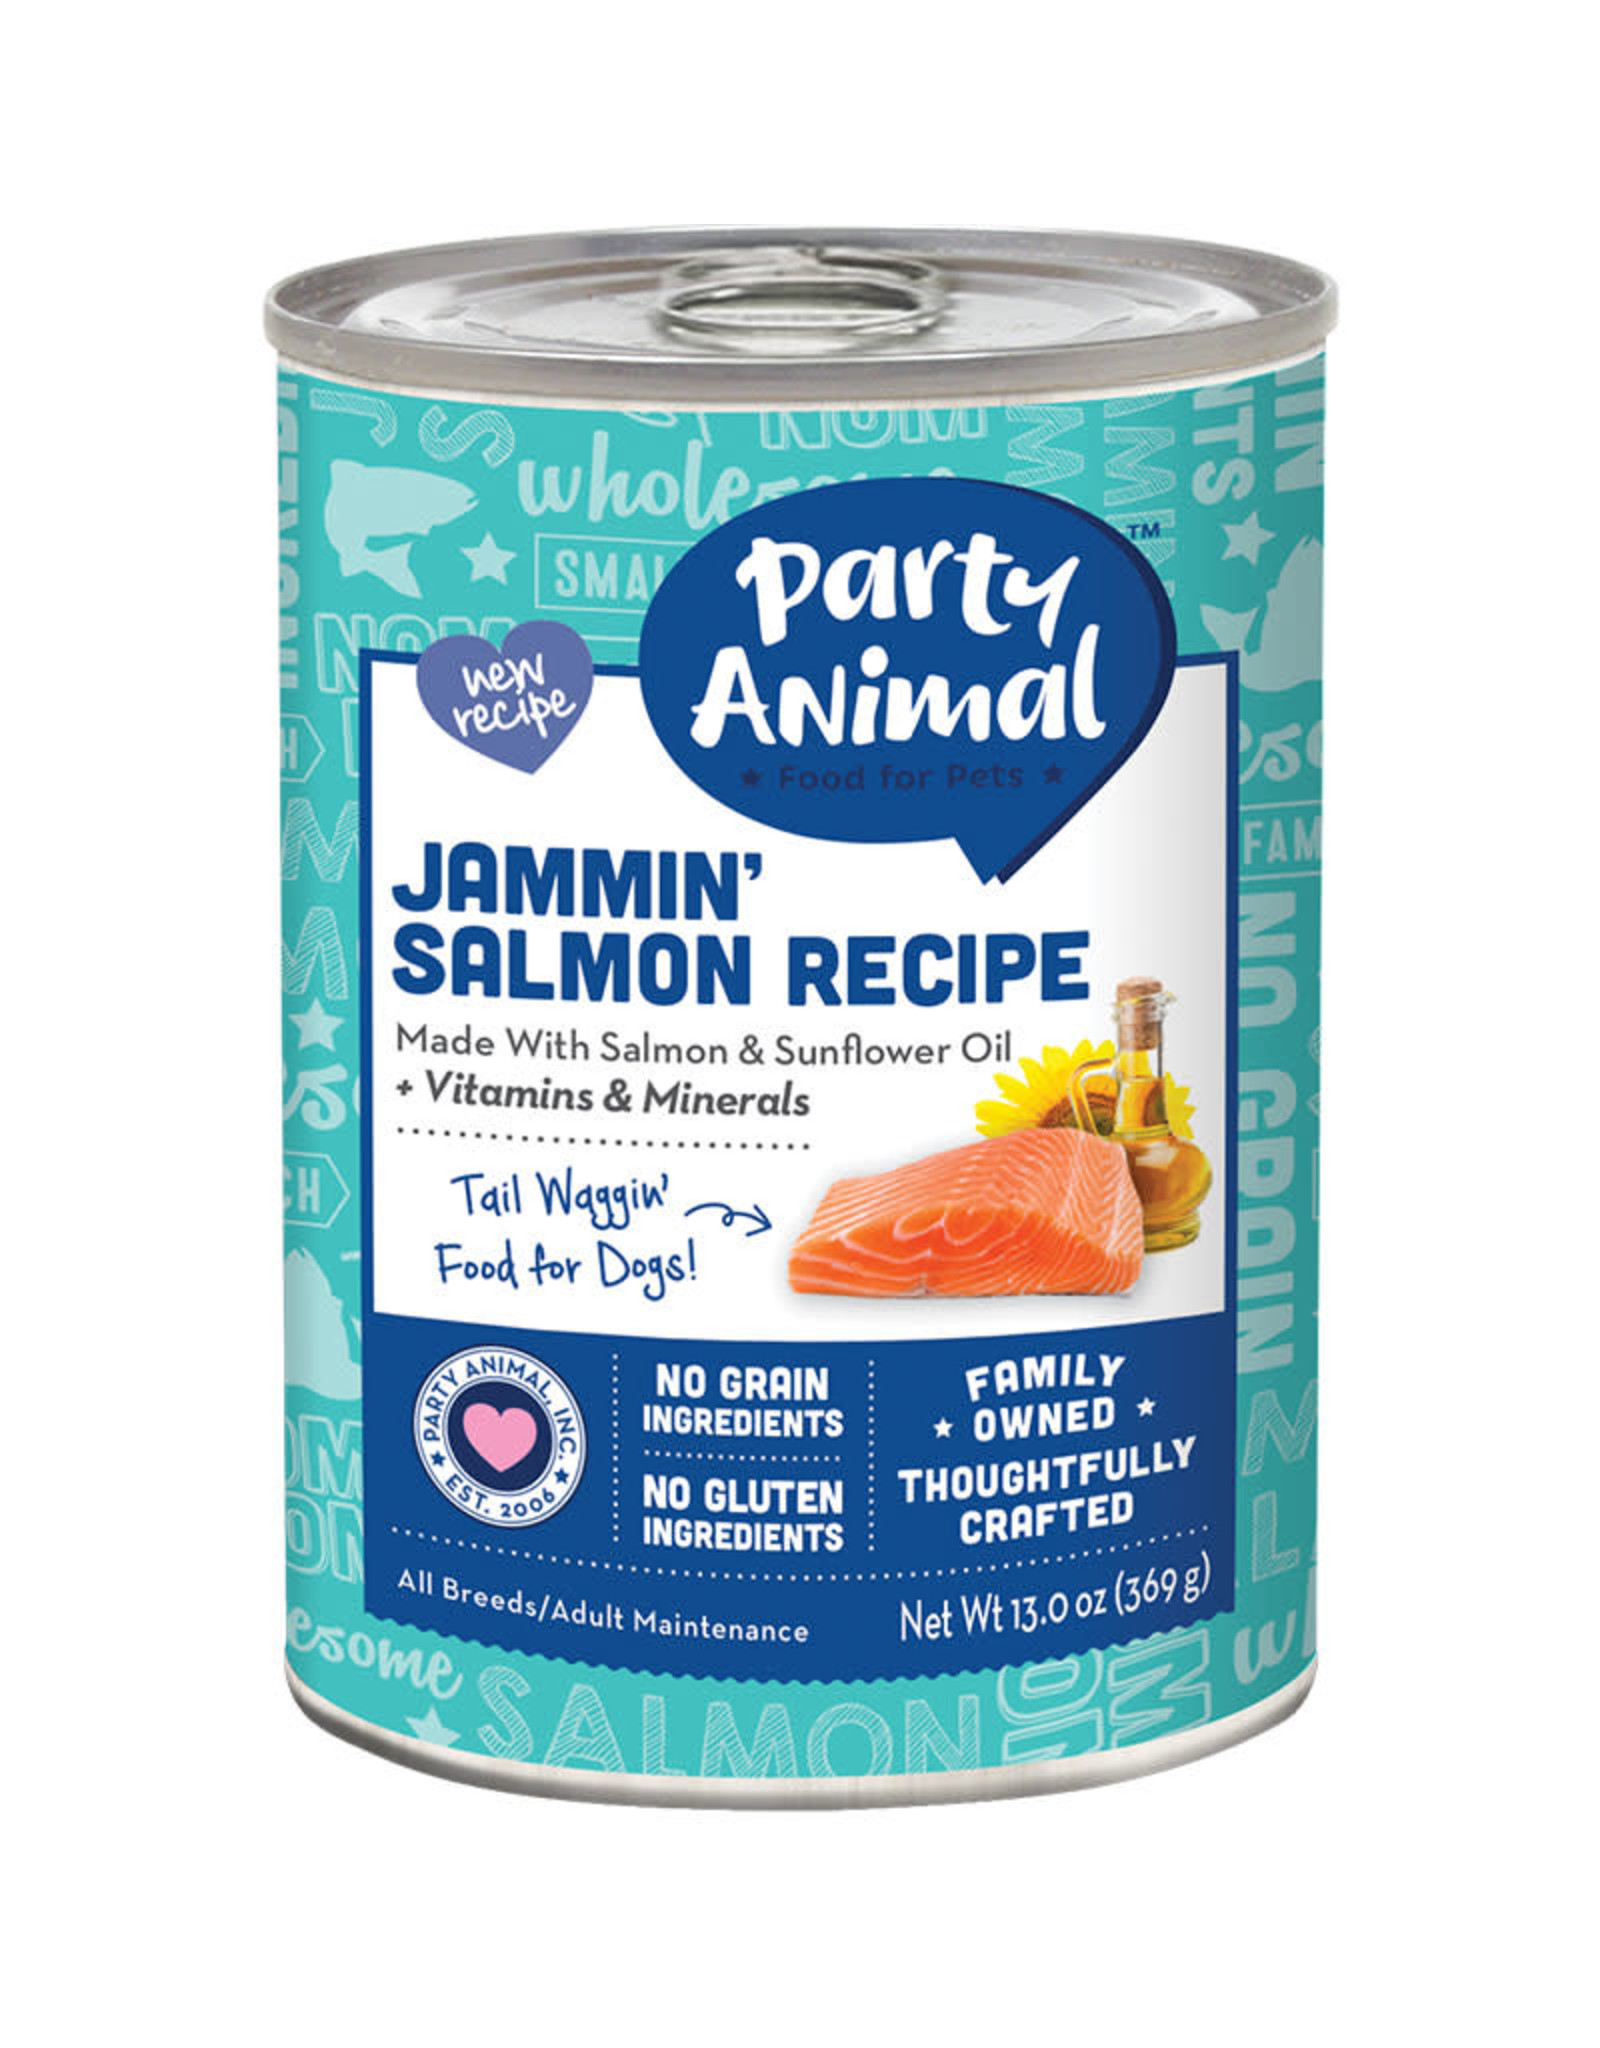 Party Animal Party Animal Jammin Salmon Recipe Dog Food 13oz